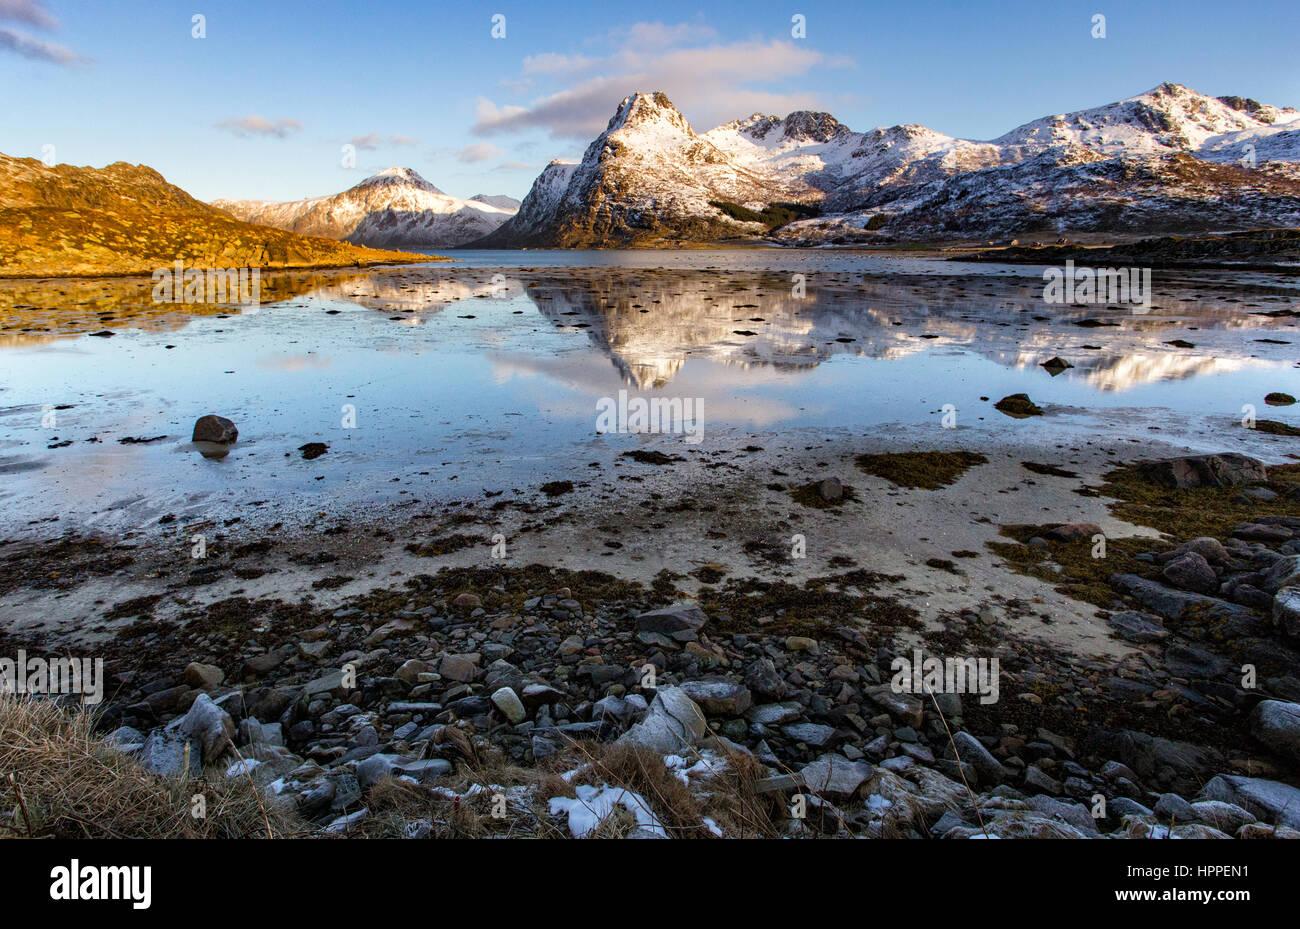 Flakstadoya mer, îles Lofoten, Norvège, Europe Photo Stock